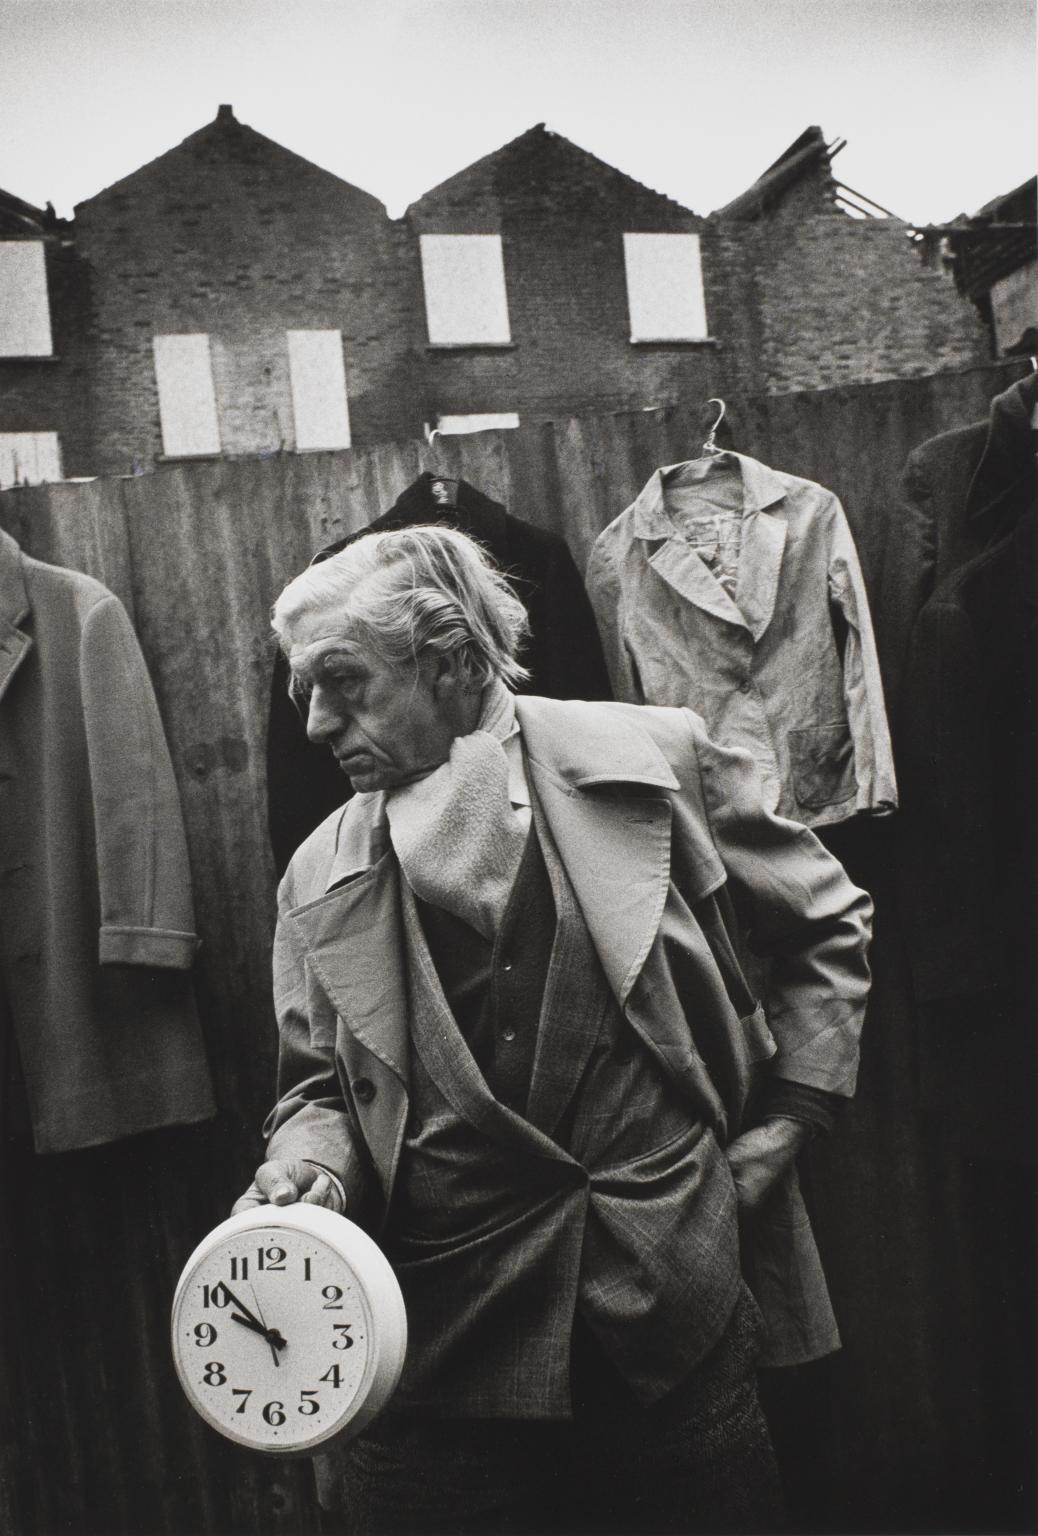 Edward s hodinami, Cheshire Street Market, Londýn, 1983